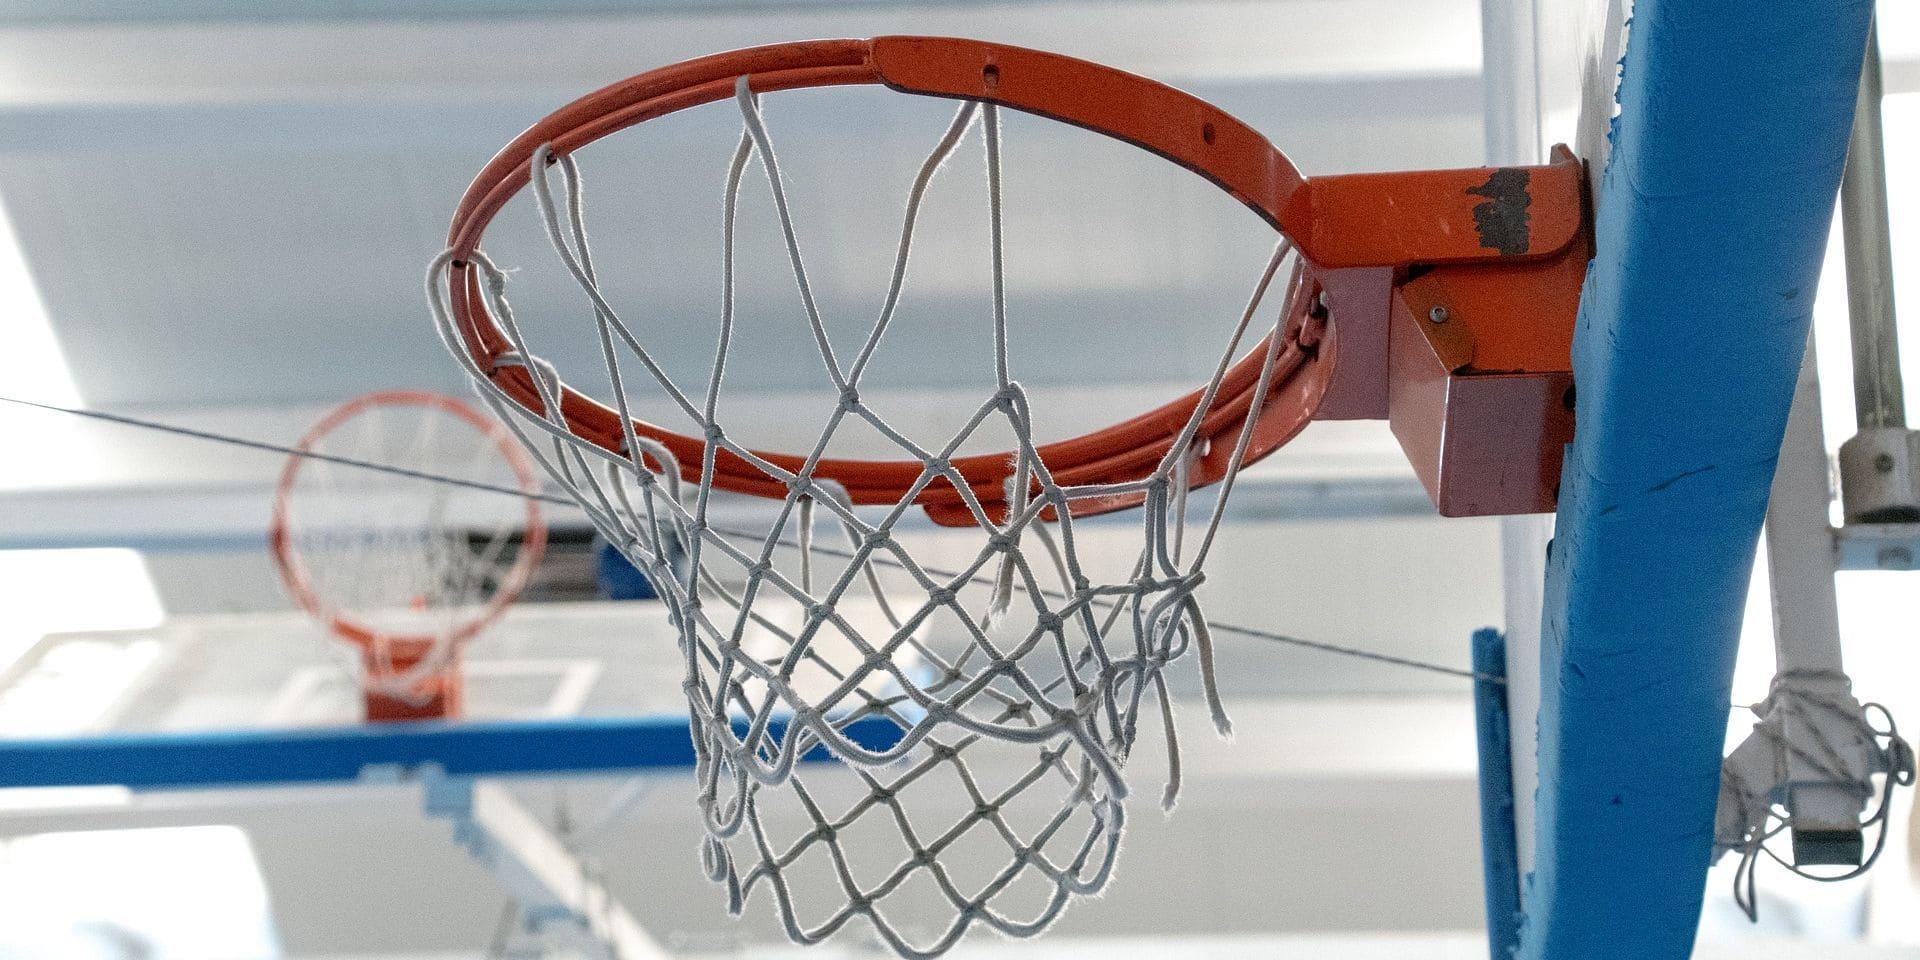 basket-ball : Une finale de playoffs atypique en P1